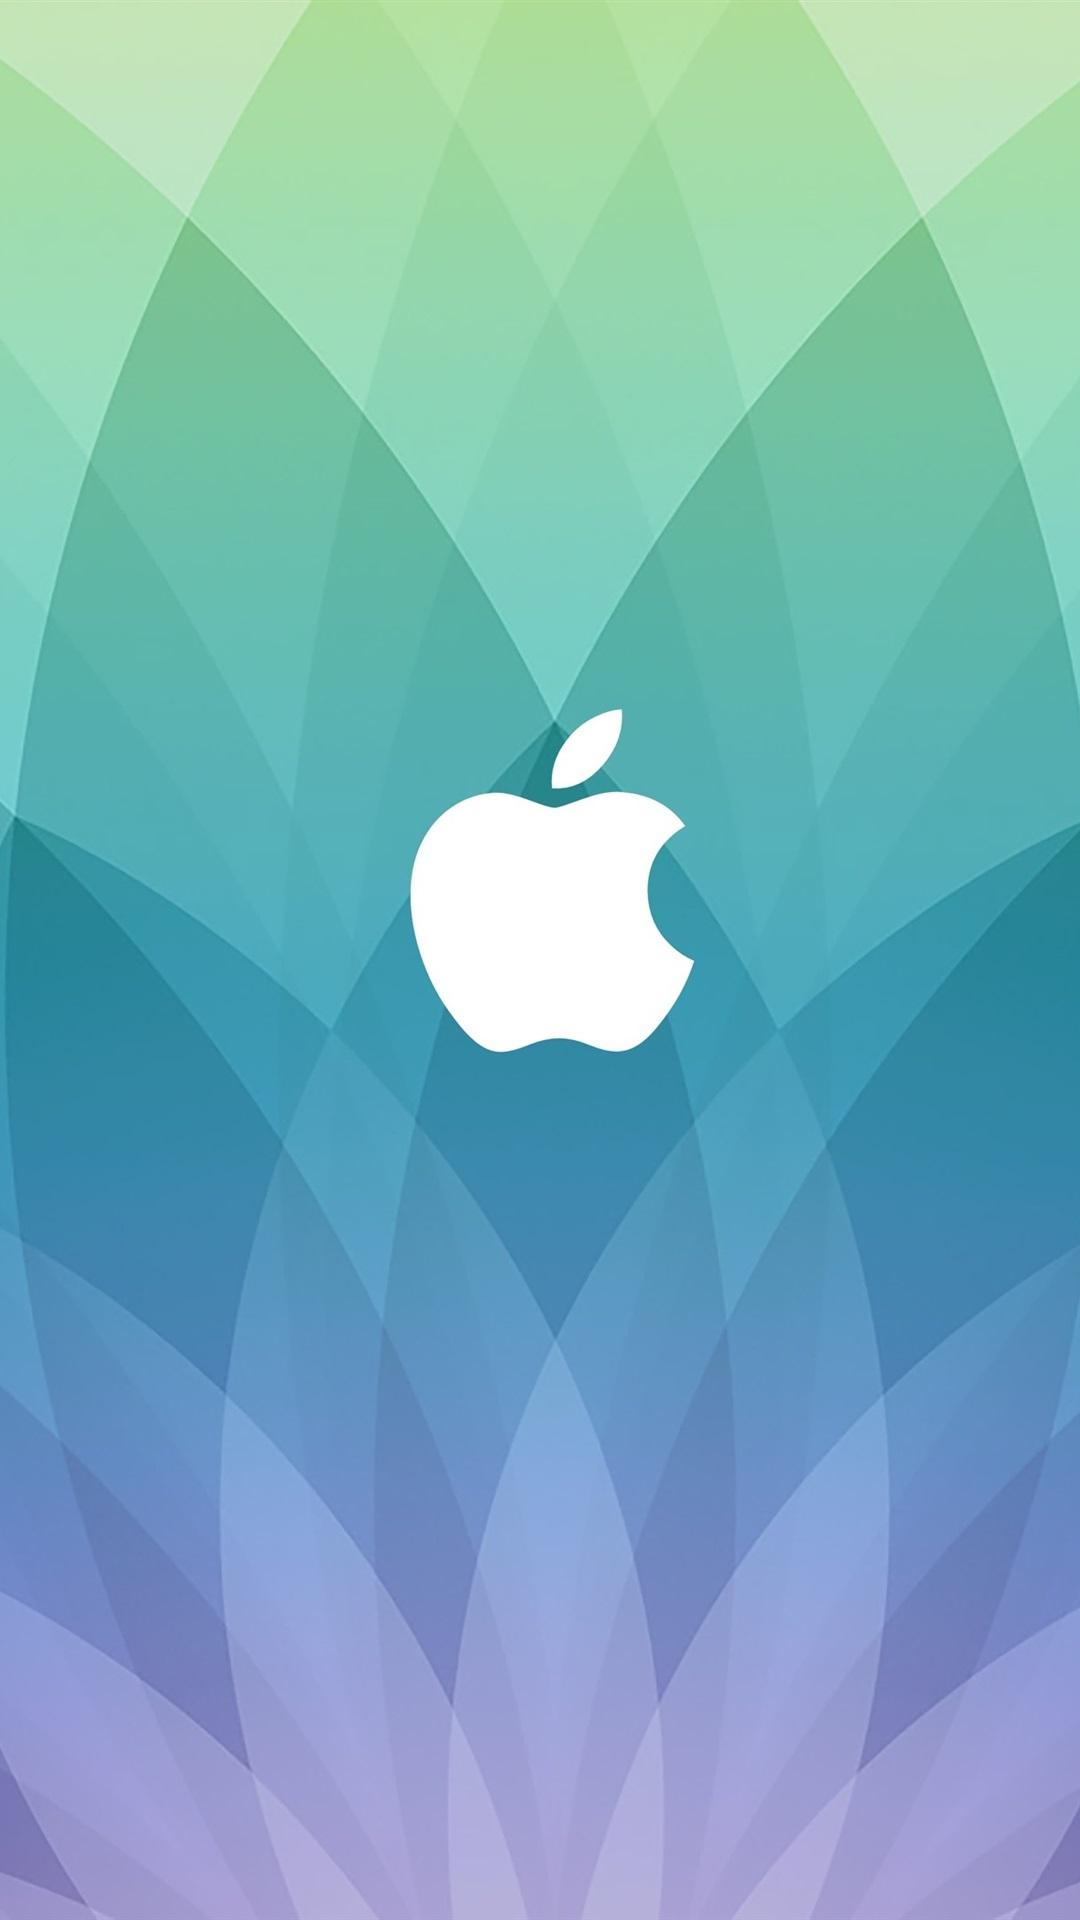 Apple logo blue sector shaped